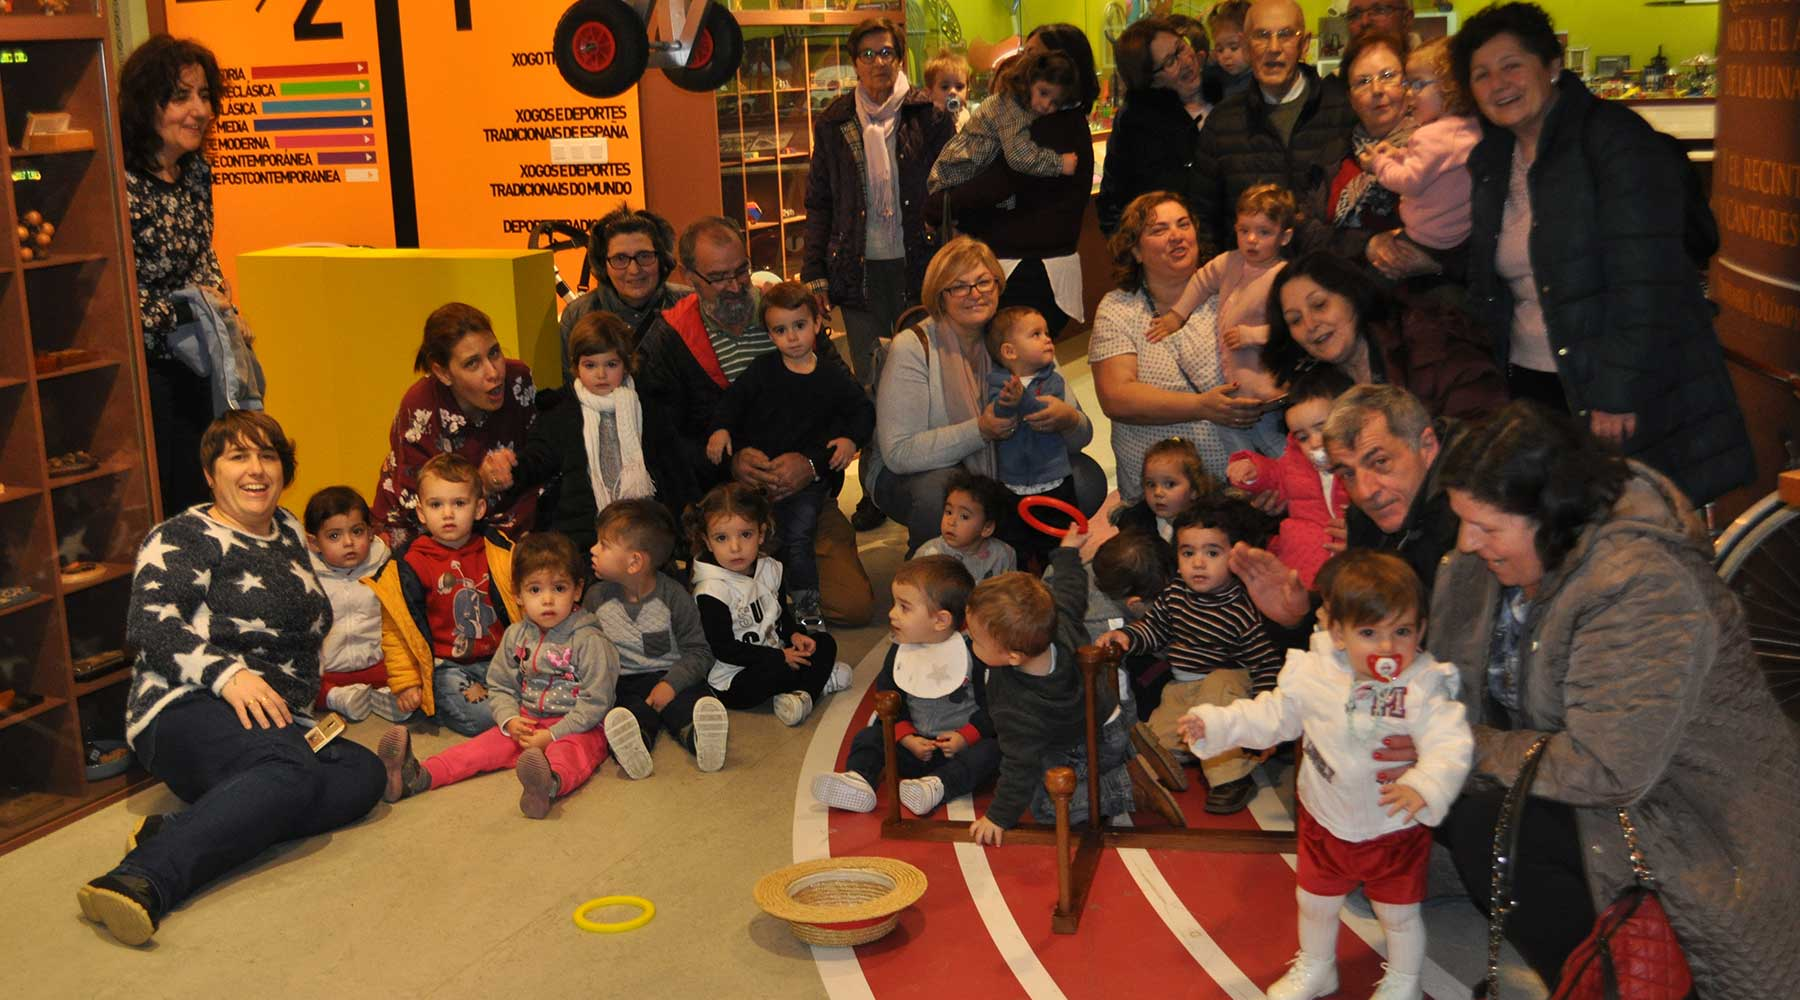 grupo O Berce Escuela Infantil los Gosendes de Arteixo